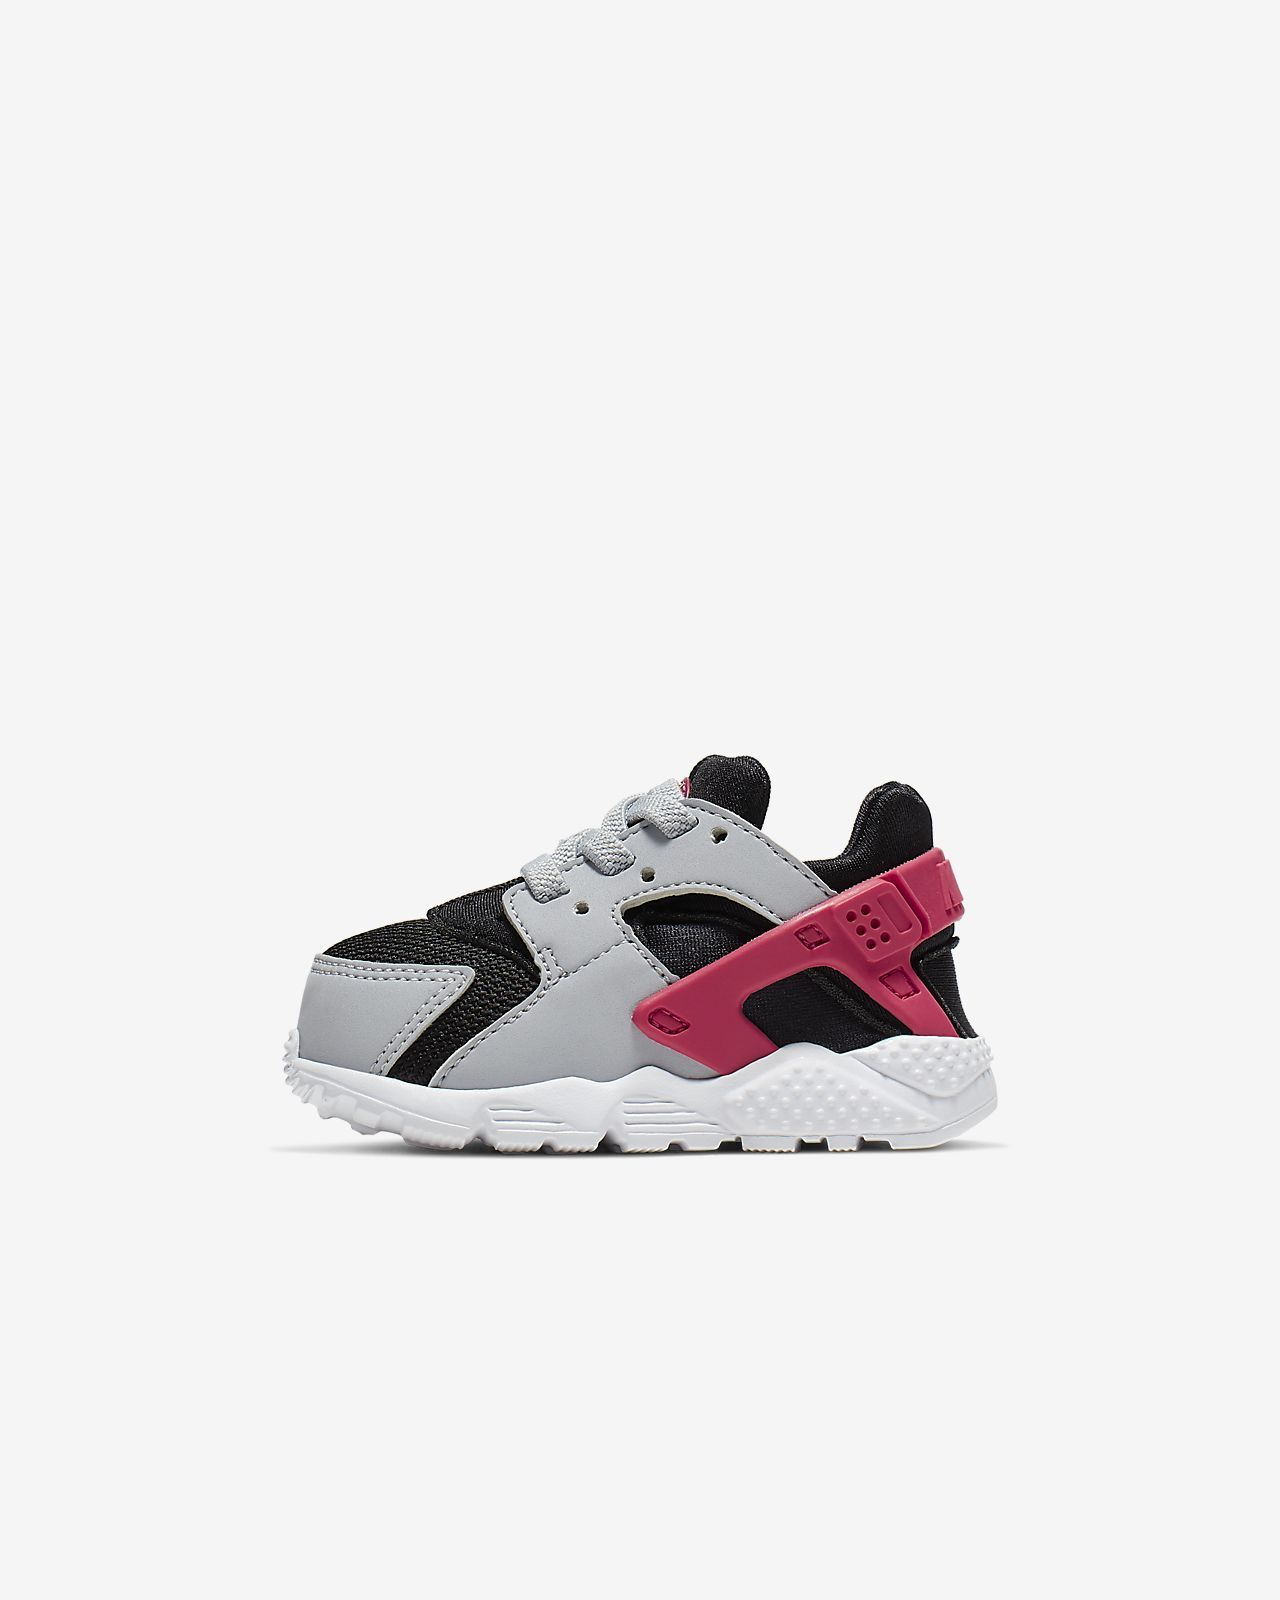 fa1f747cec81 Nike Huarache Infant Toddler Shoe. Nike.com